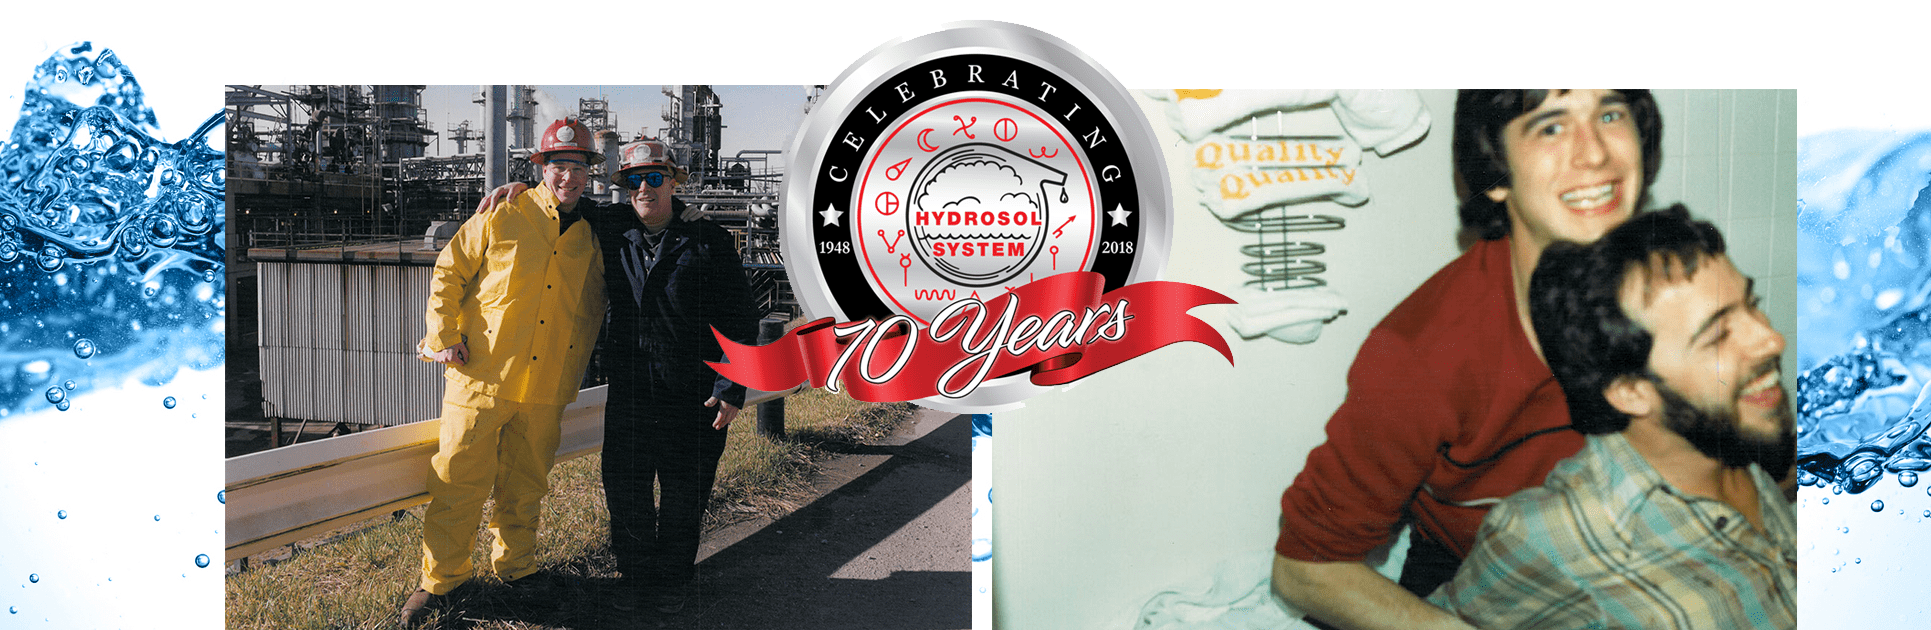 Hydrosol is Celebrating 70 Years!